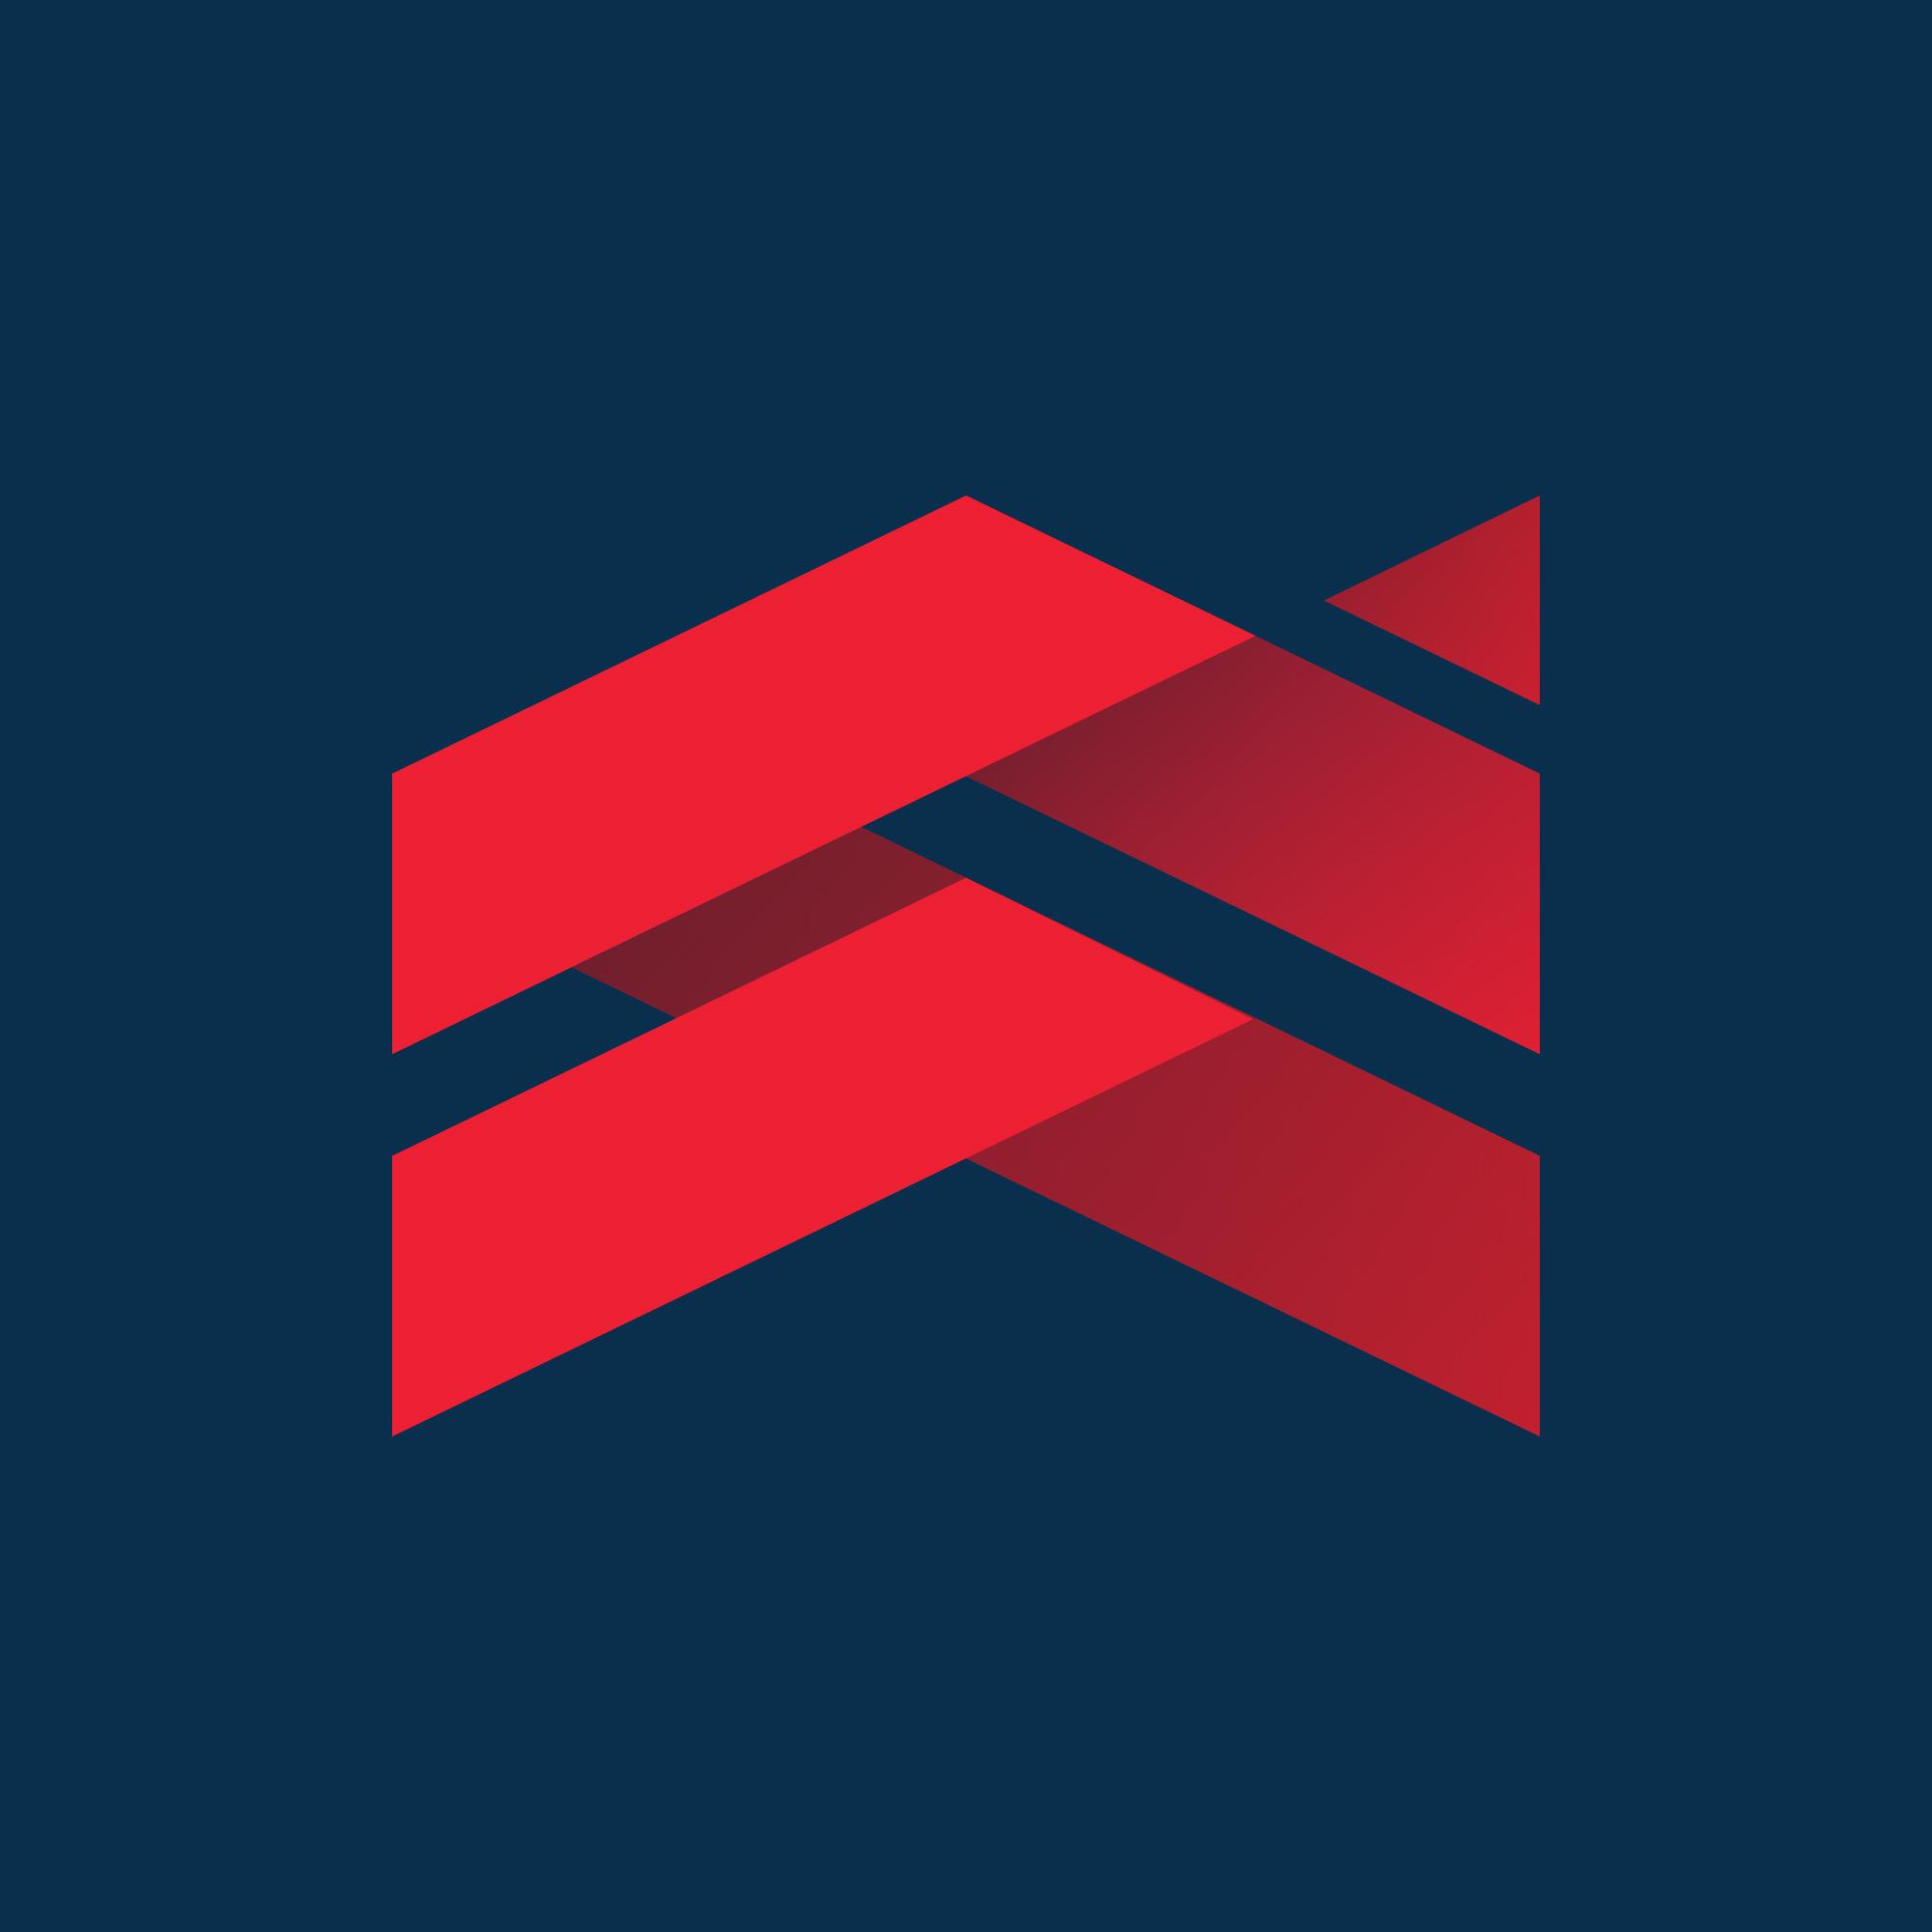 https://sconcept.be/wp-content/uploads/2020/01/logo-cooman-4.jpg